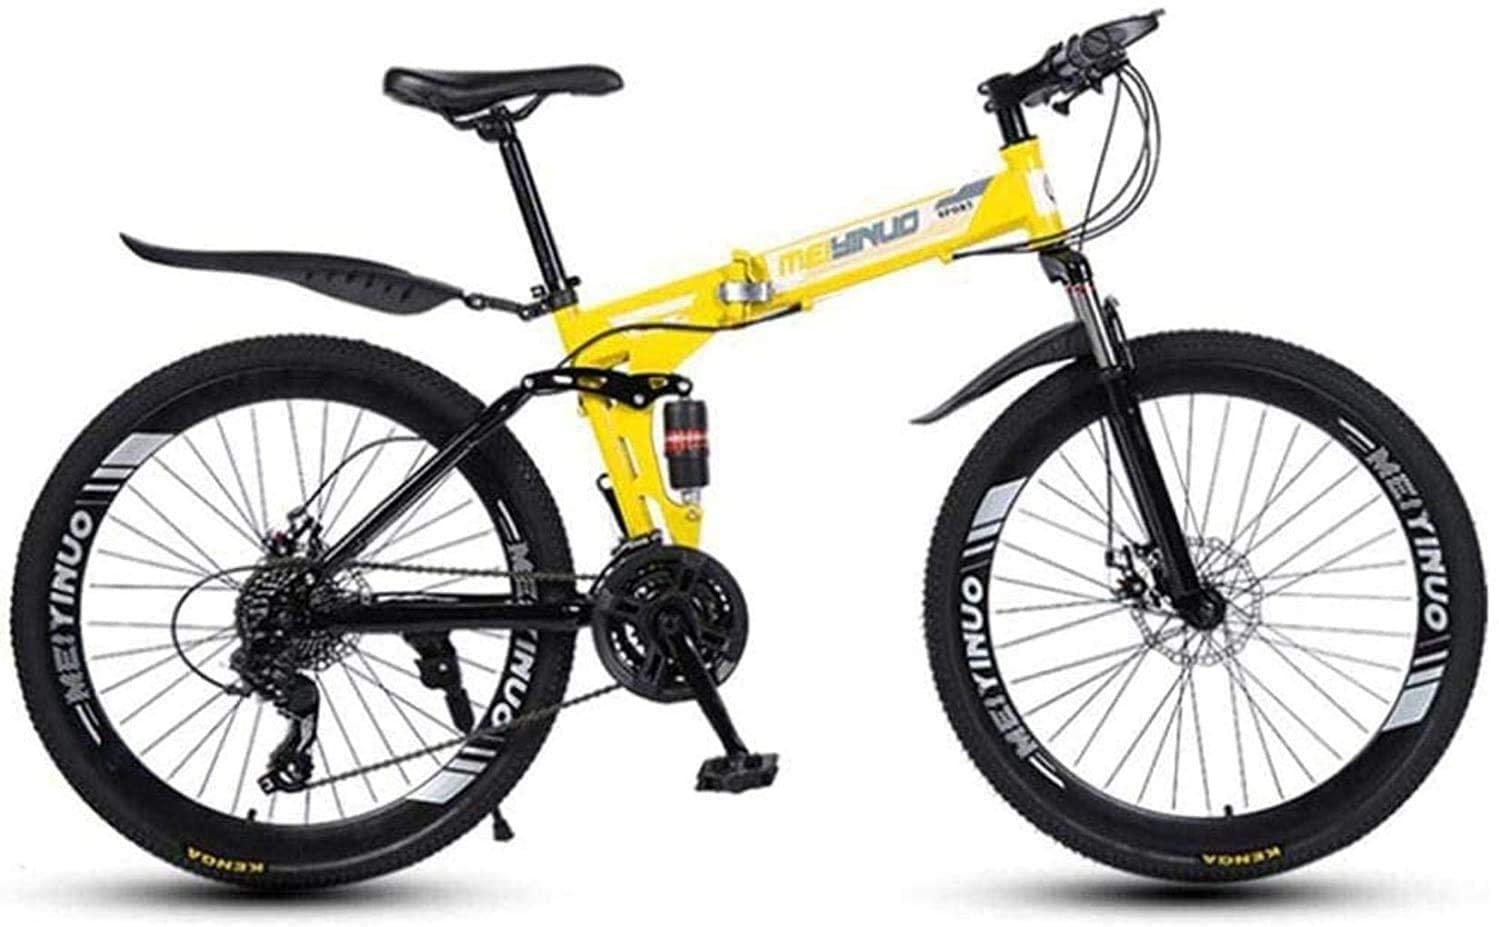 CSS Mountain Bike Folding Bikes, 26Inch 27-Speed Double Disc Brake Full Suspension Anti-Slip, Lightweight Aluminum Frame, Suspension Fork 7-10,27 Speed